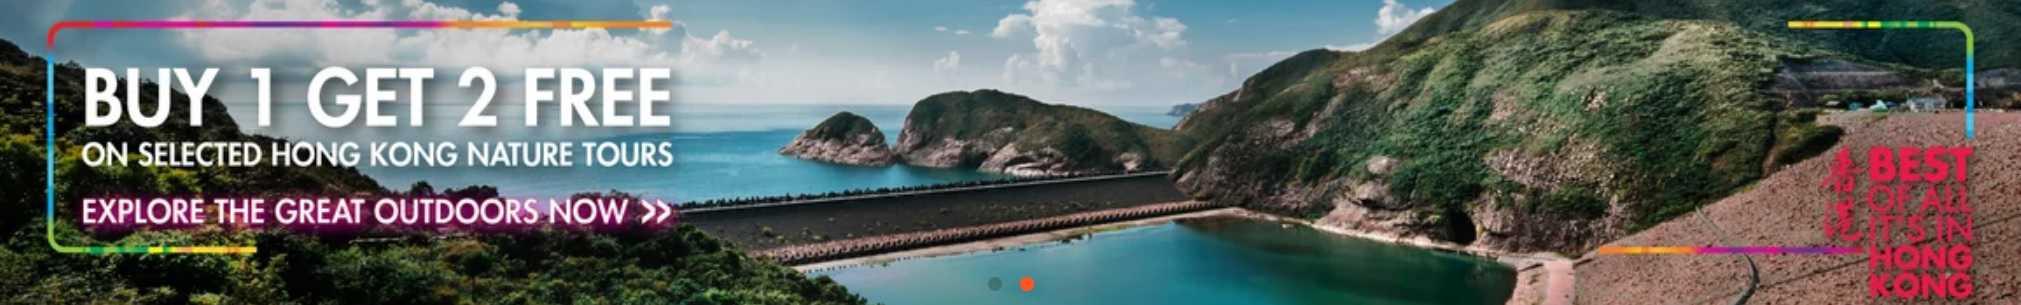 Klook HK outdoor trail